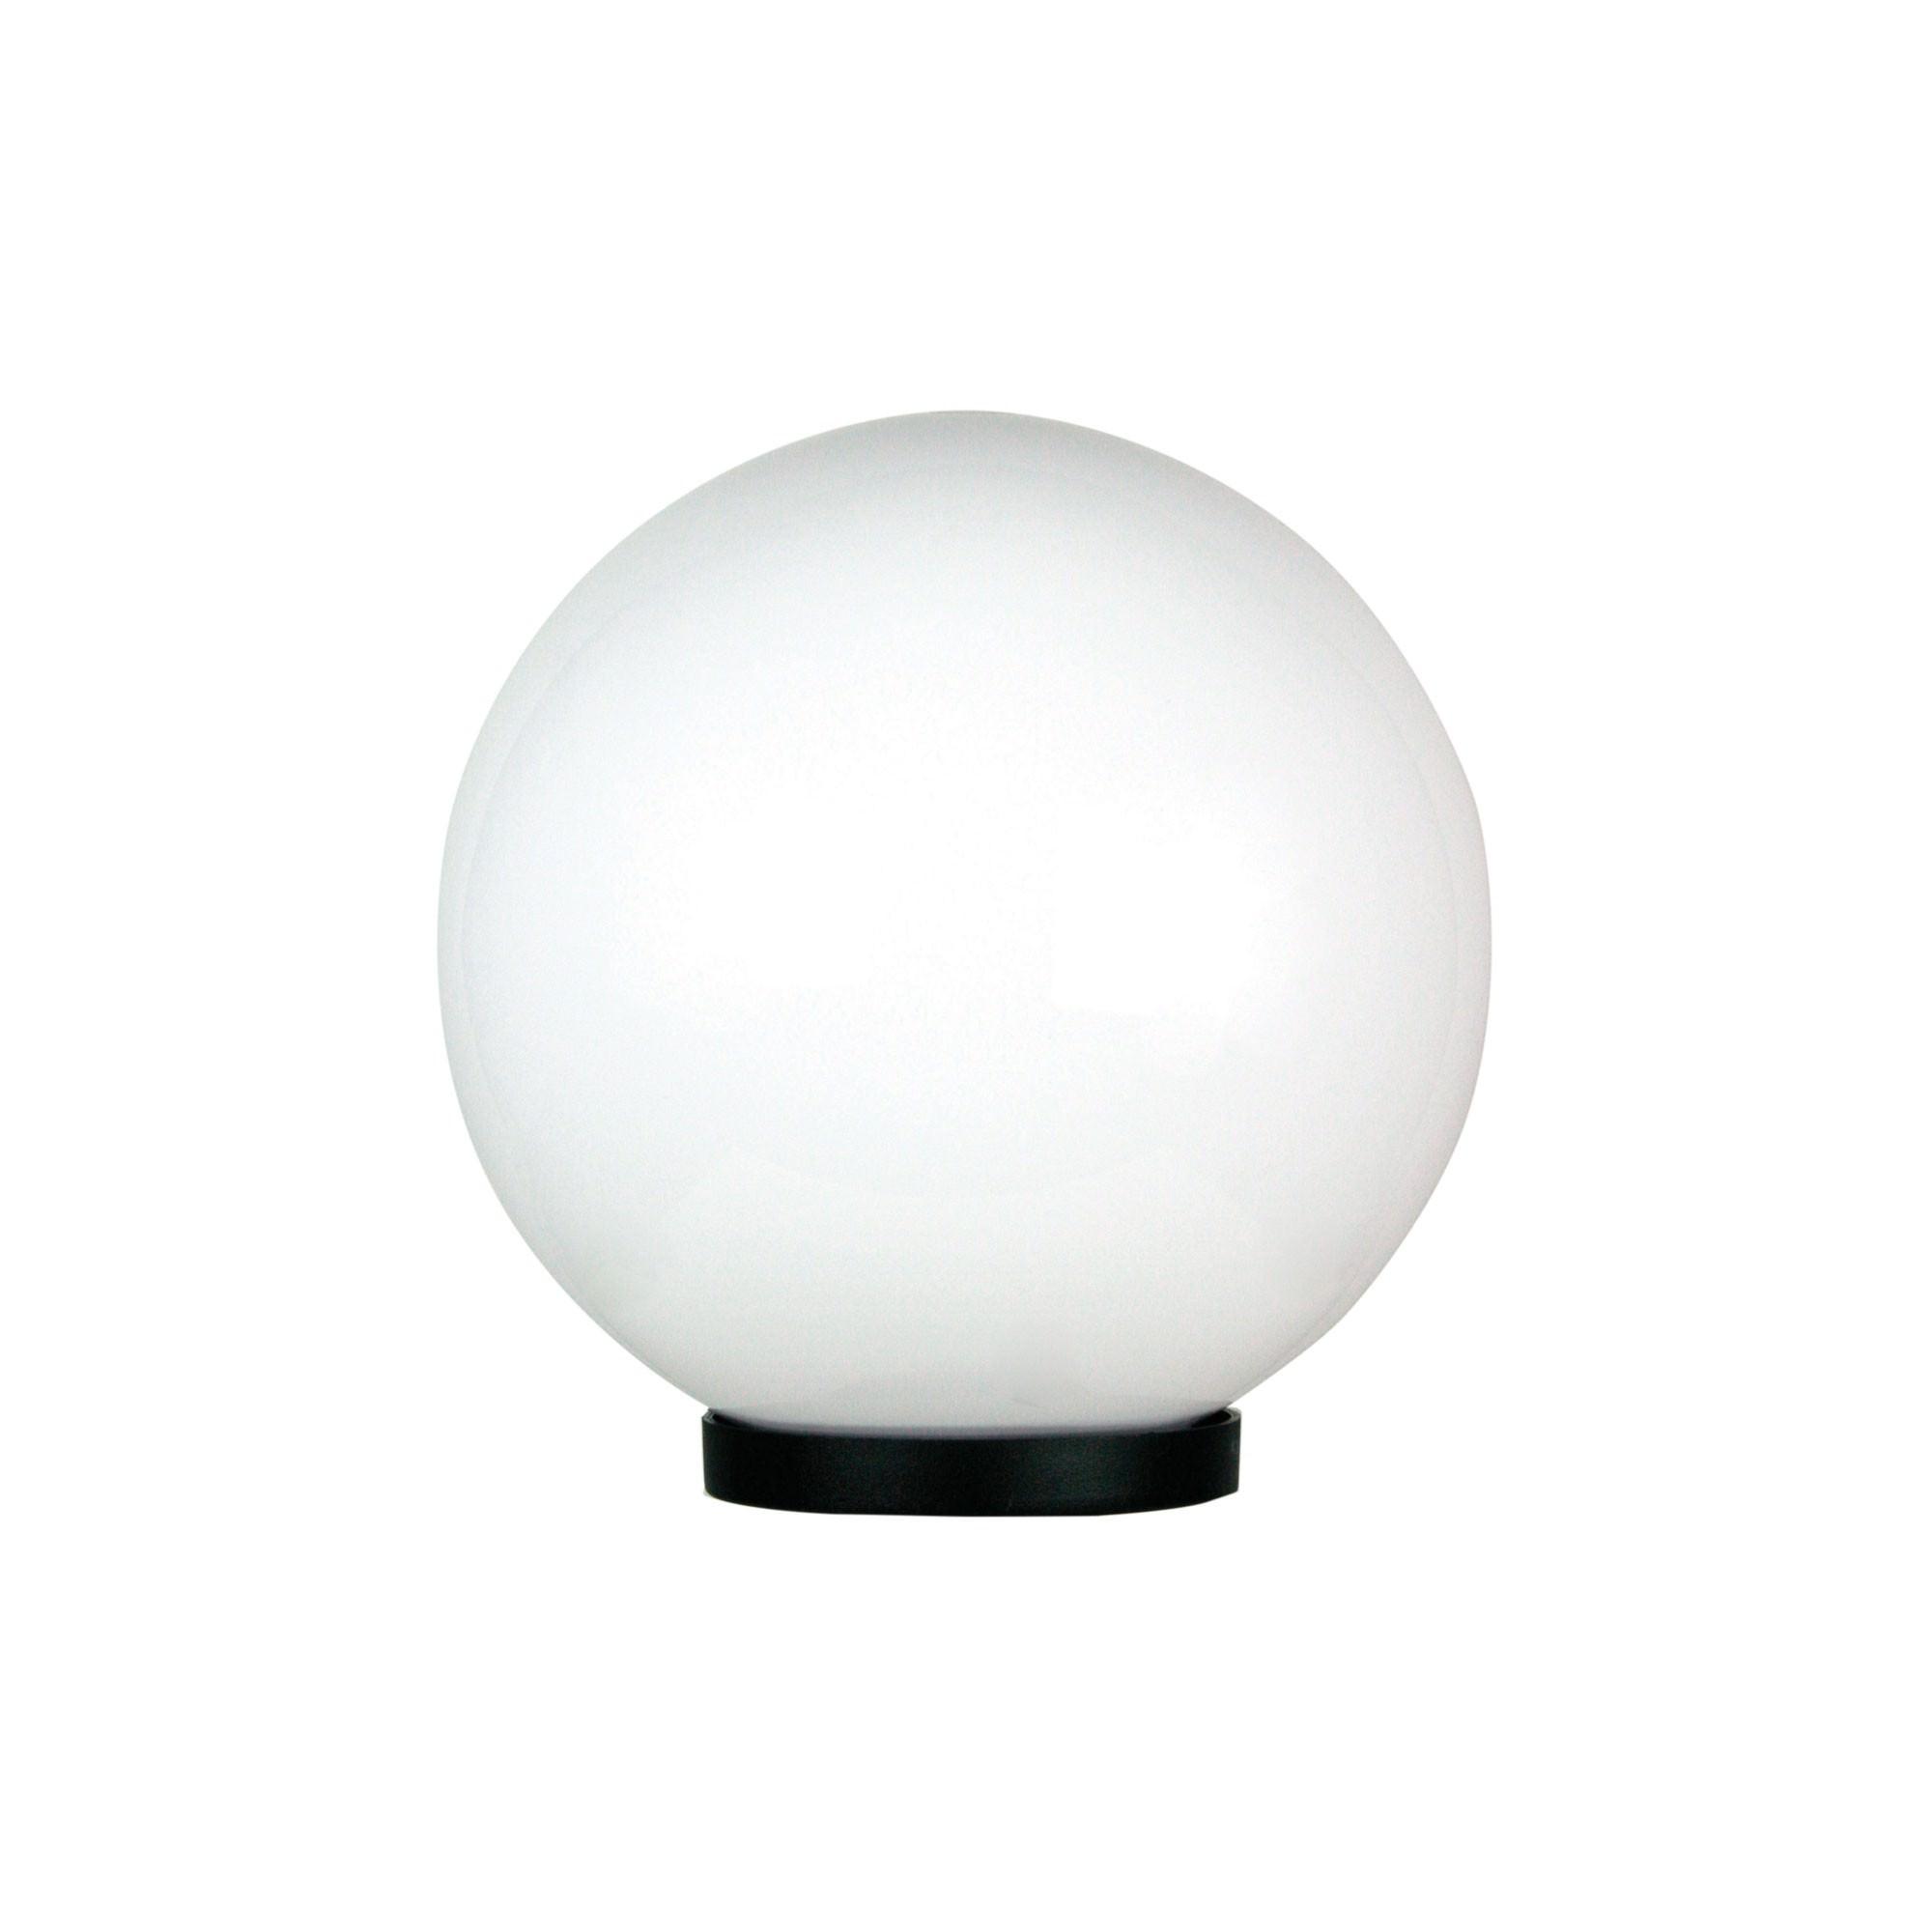 Galactic IP44 Exterior Sphere Post Top Light, 25cm